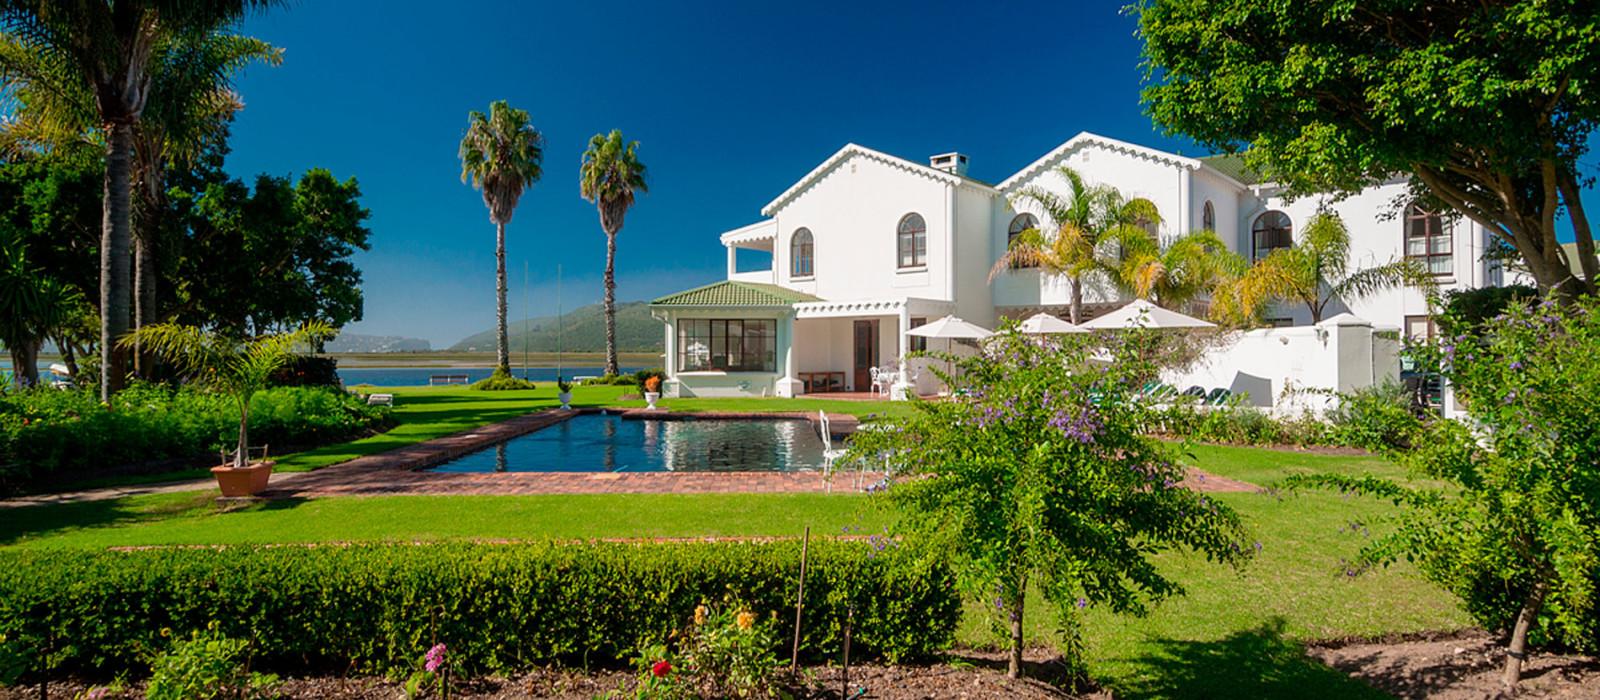 Hotel St James of Kynsna Südafrika